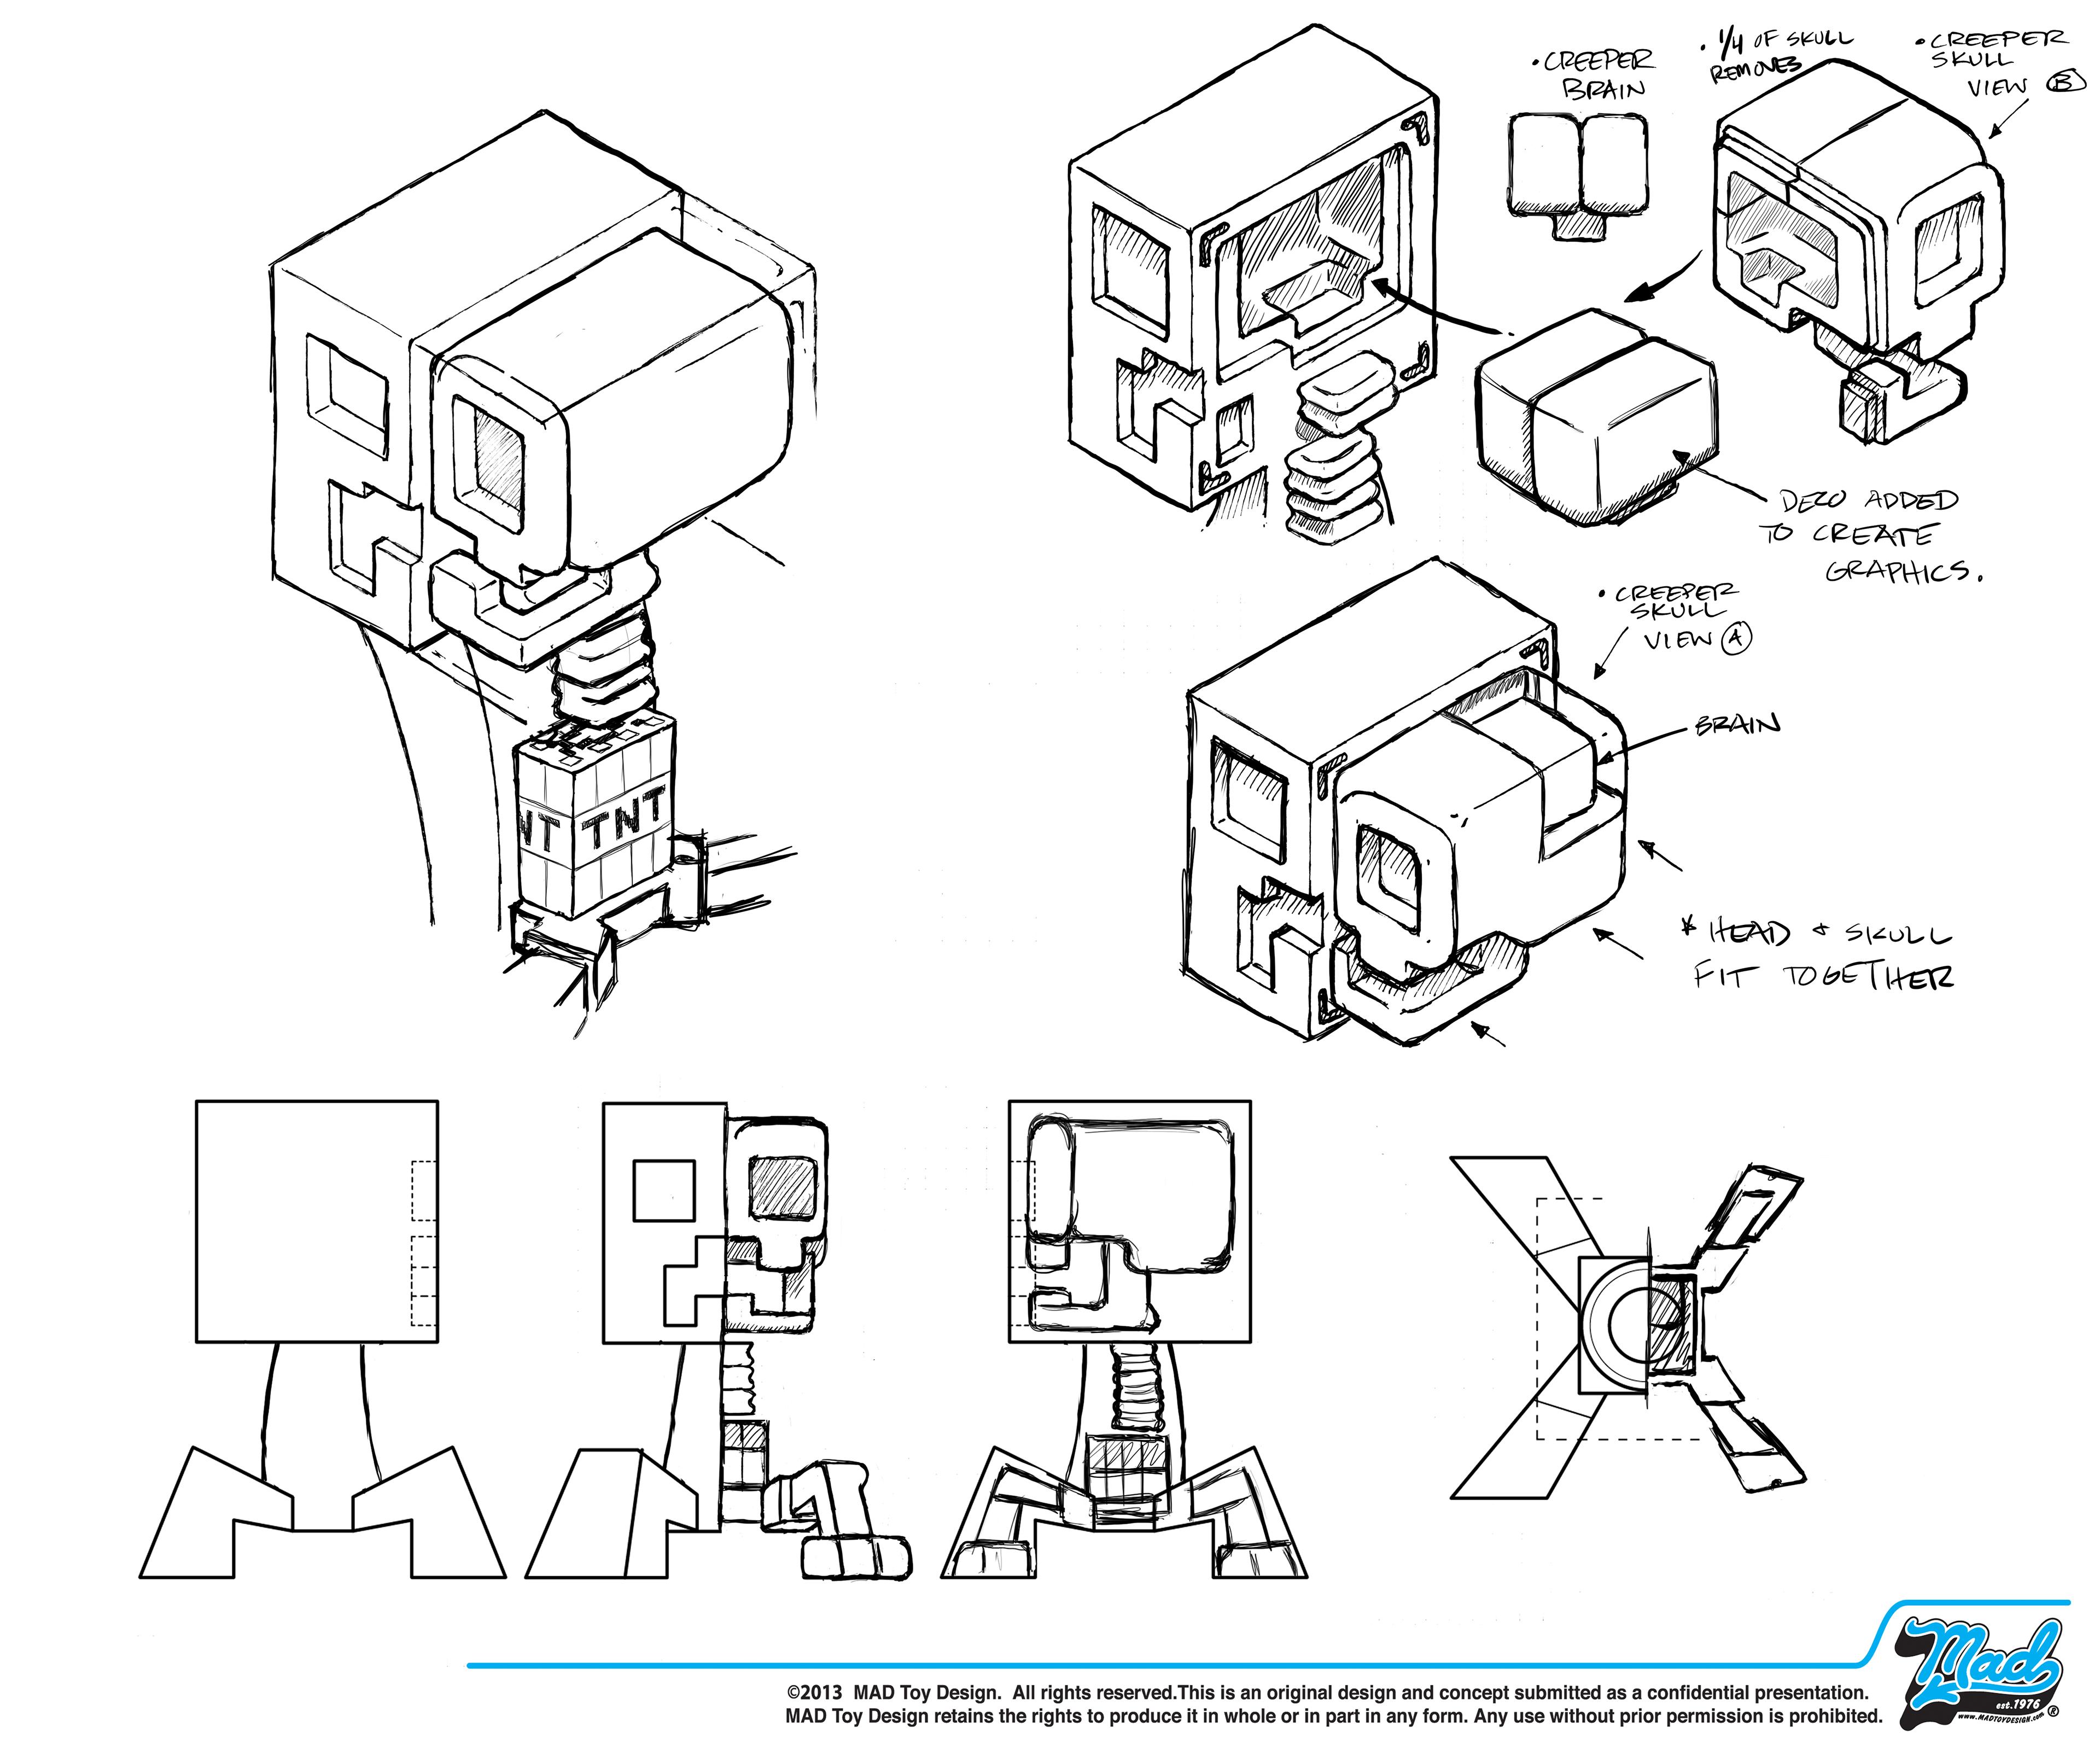 MAD Toy Design, Inc. - CREEPER Anatomy